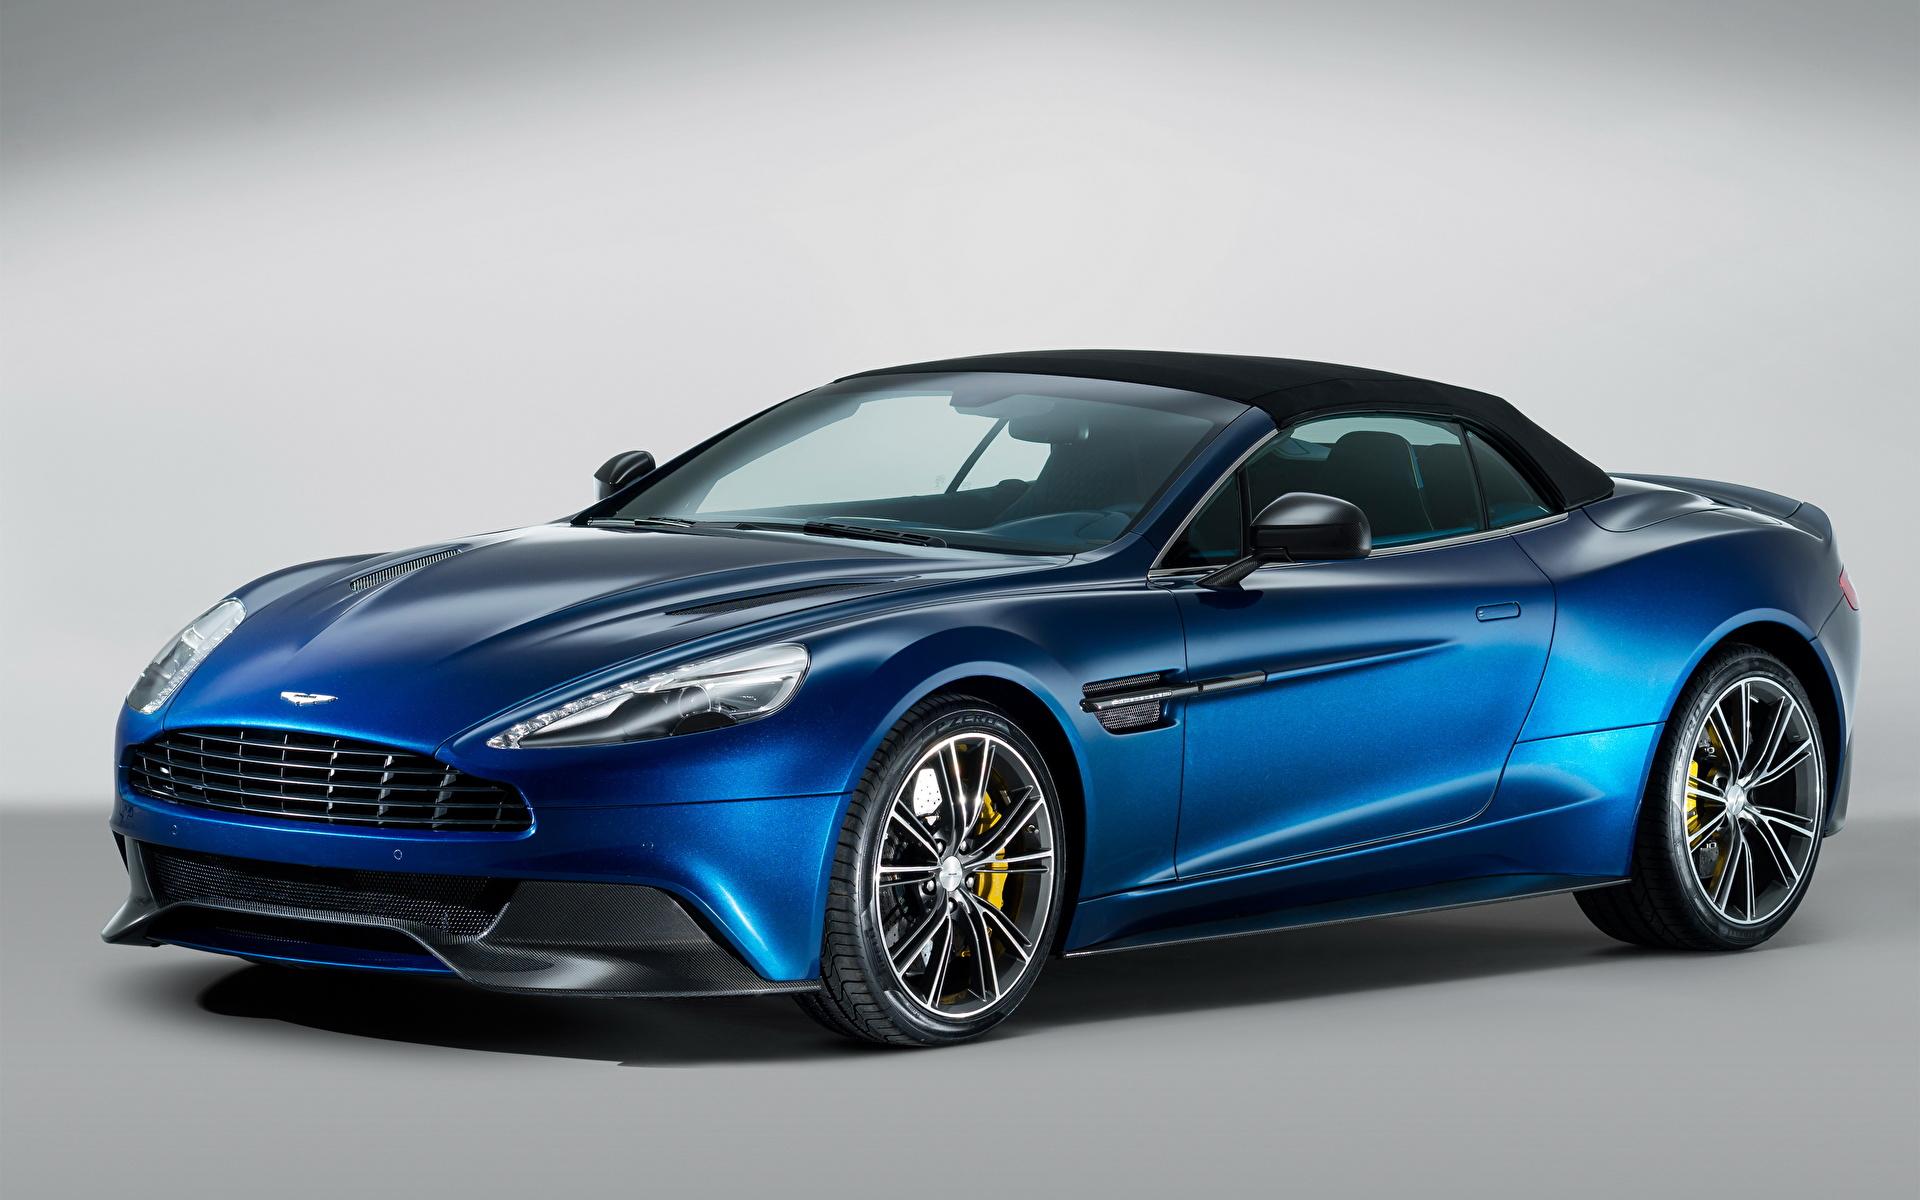 синий автомобиль Aston Martin  № 2593867 бесплатно